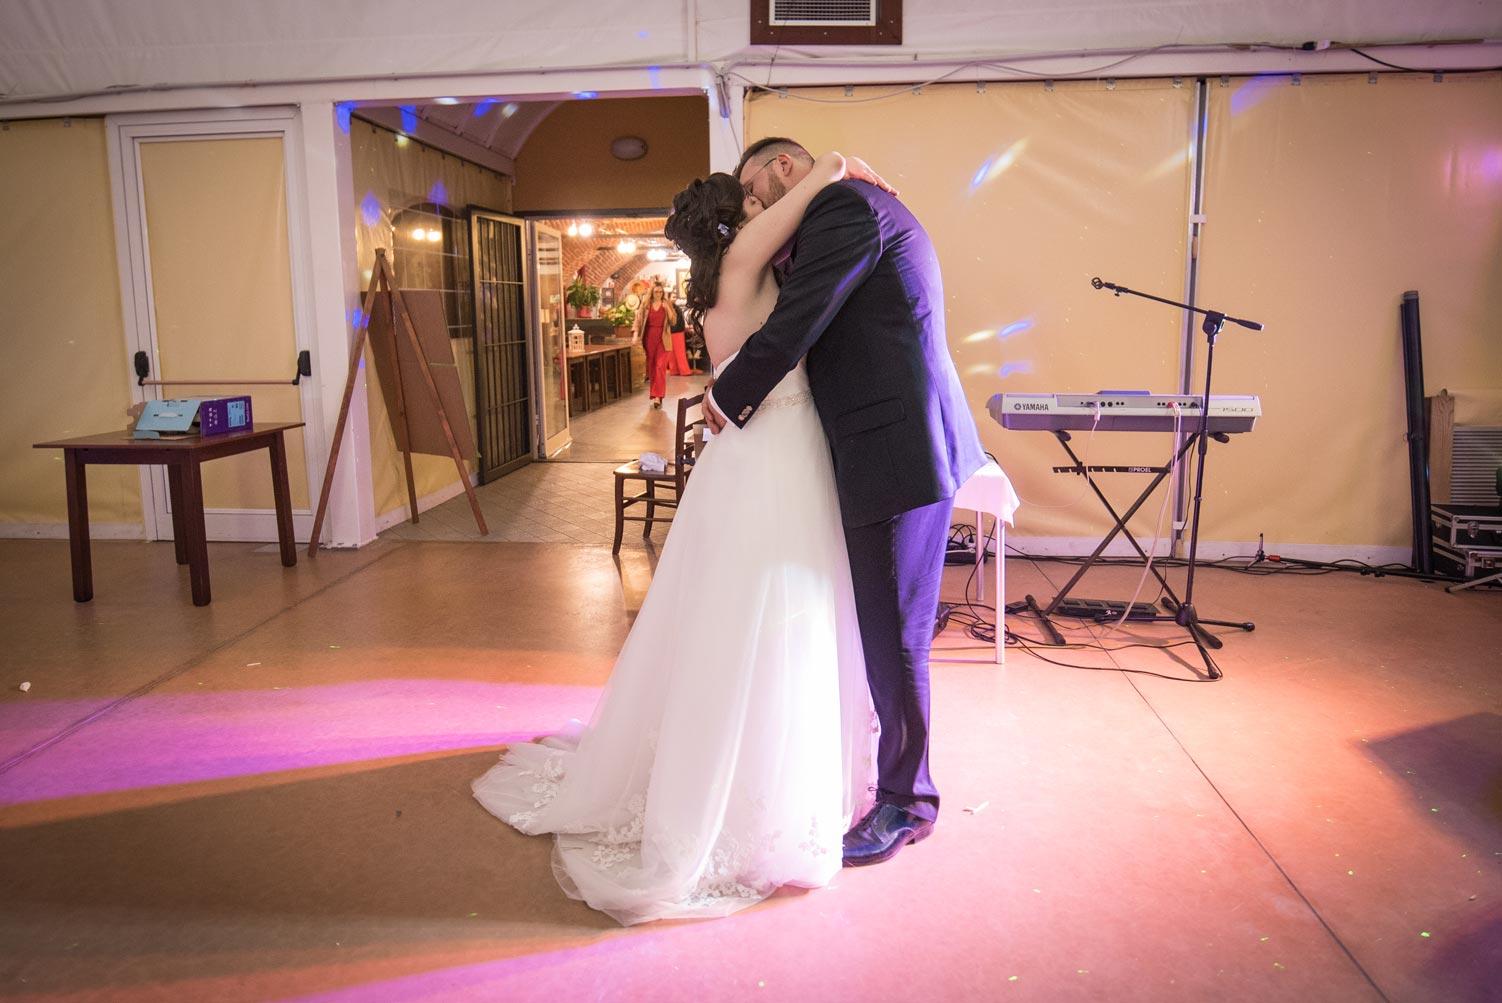 Matrimonio a Narzole Lorenza Diego - DSC 0895 - Fotografie matrimonio ballo - Fotografie matrimonio ballo